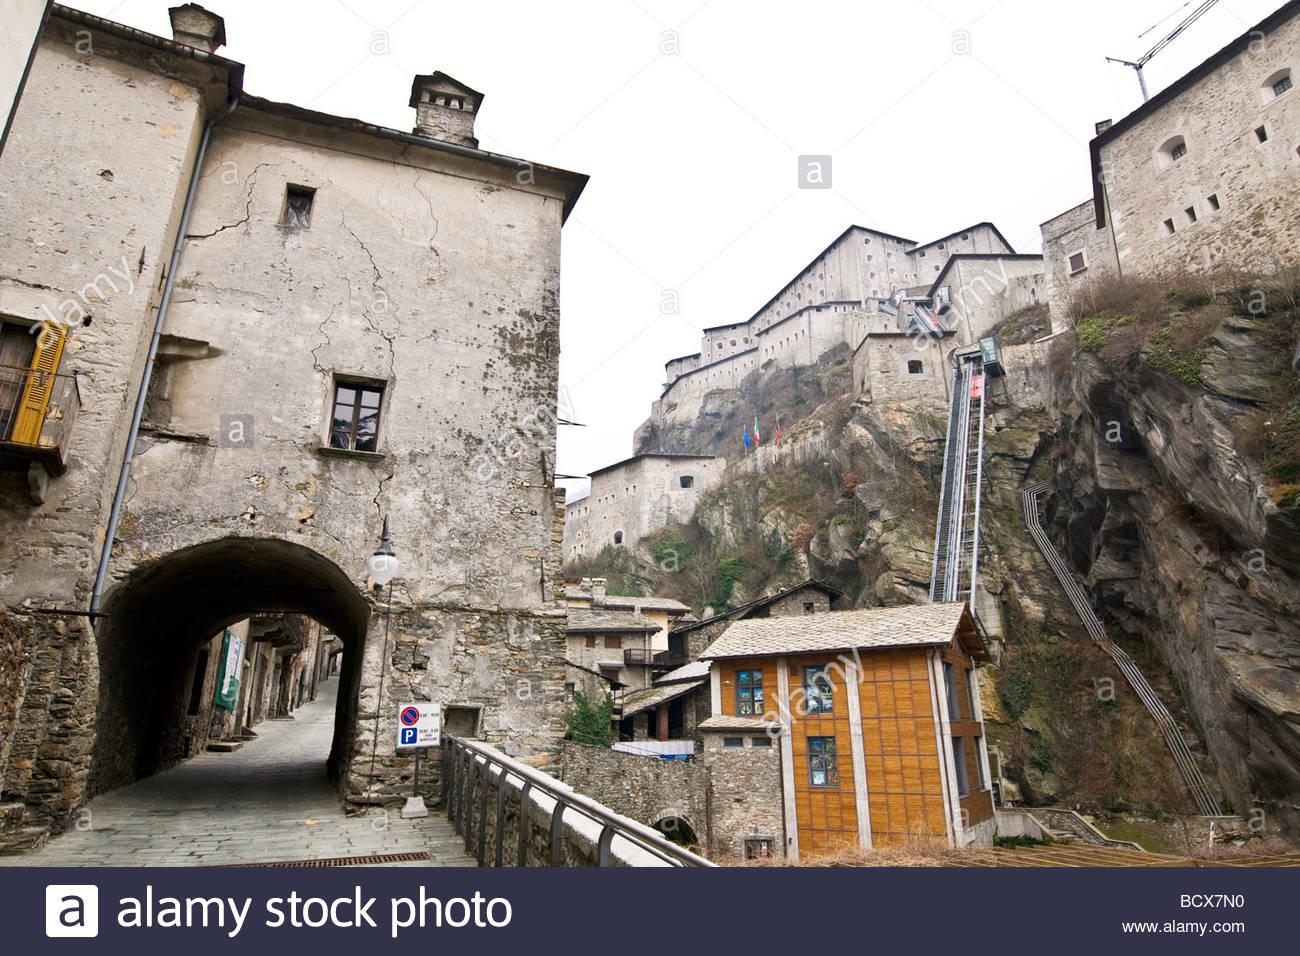 bard, valle d'aosta, italy - Stock Image